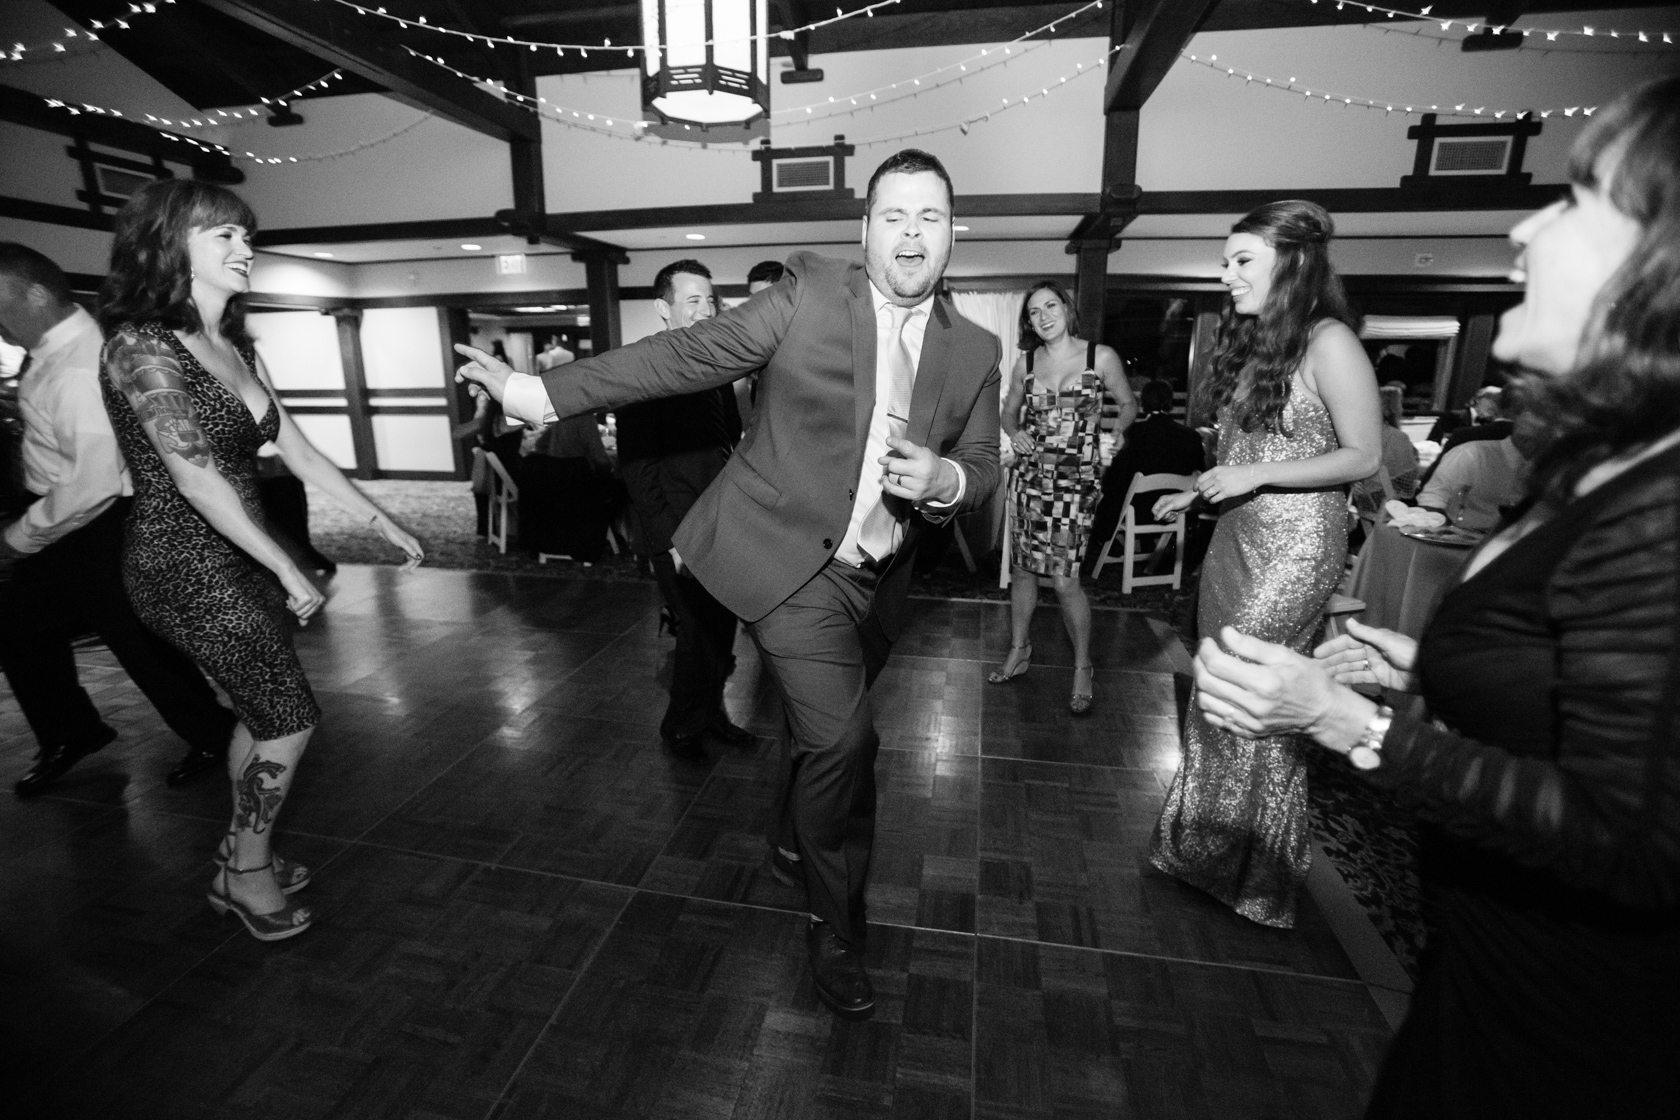 The_Lodge_at_Torrey_Pines_Wedding_116.jpg